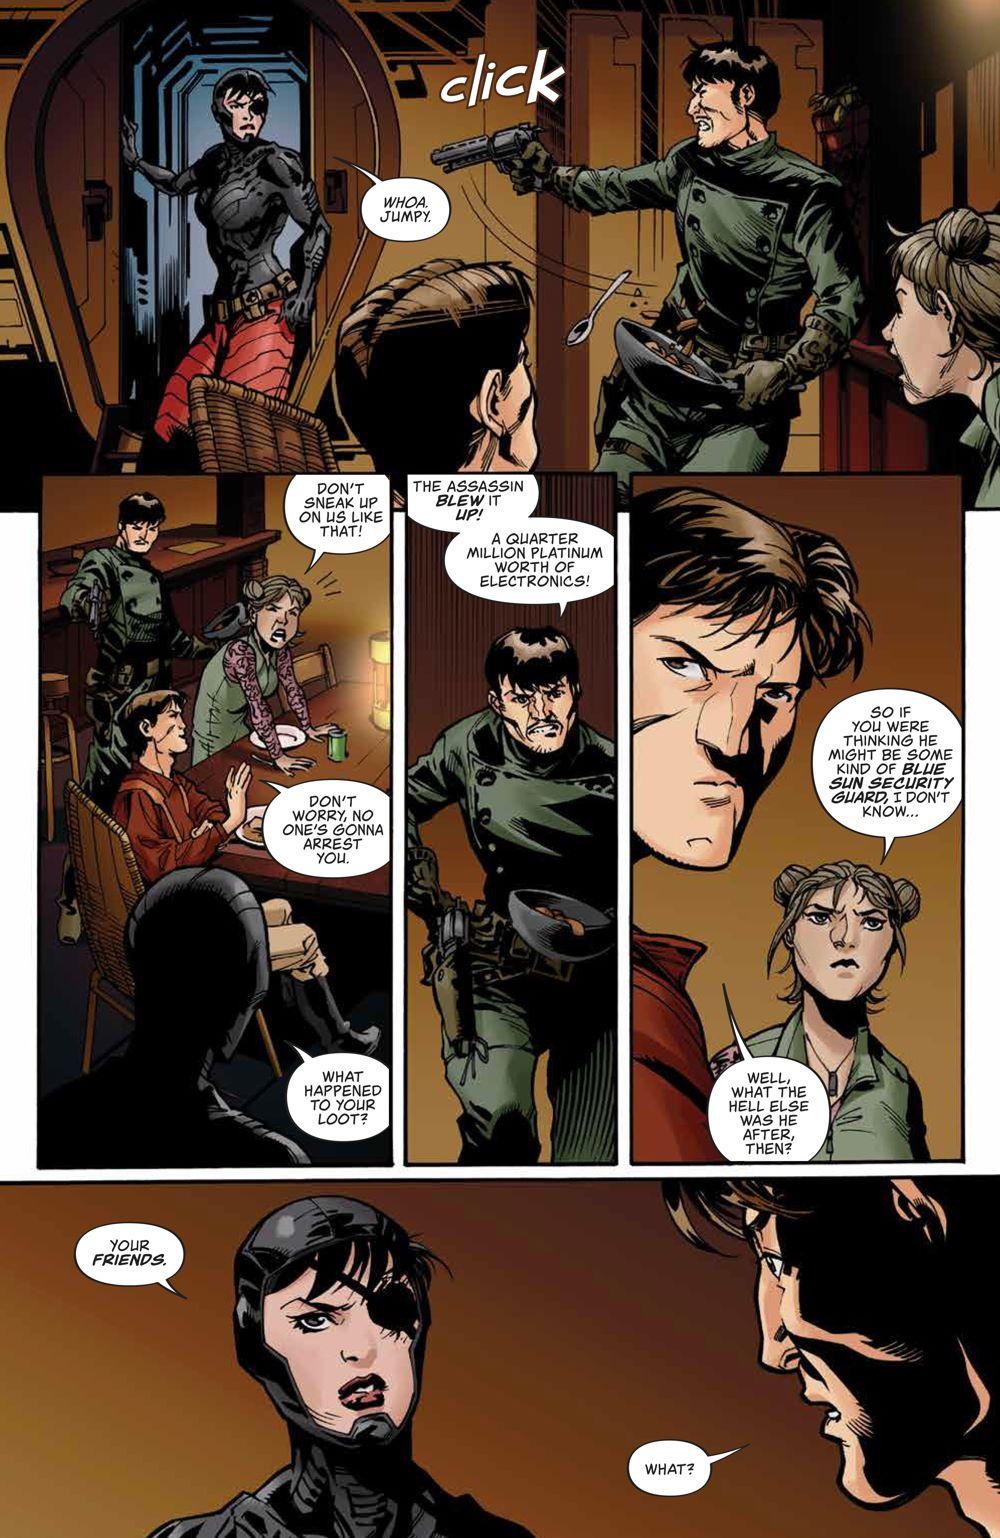 Firefly_NewSheriffVerse_v2_HC_PRESS_24 ComicList Previews: FIREFLY NEW SHERIFF IN THE 'VERSE VOLUME 2 HC